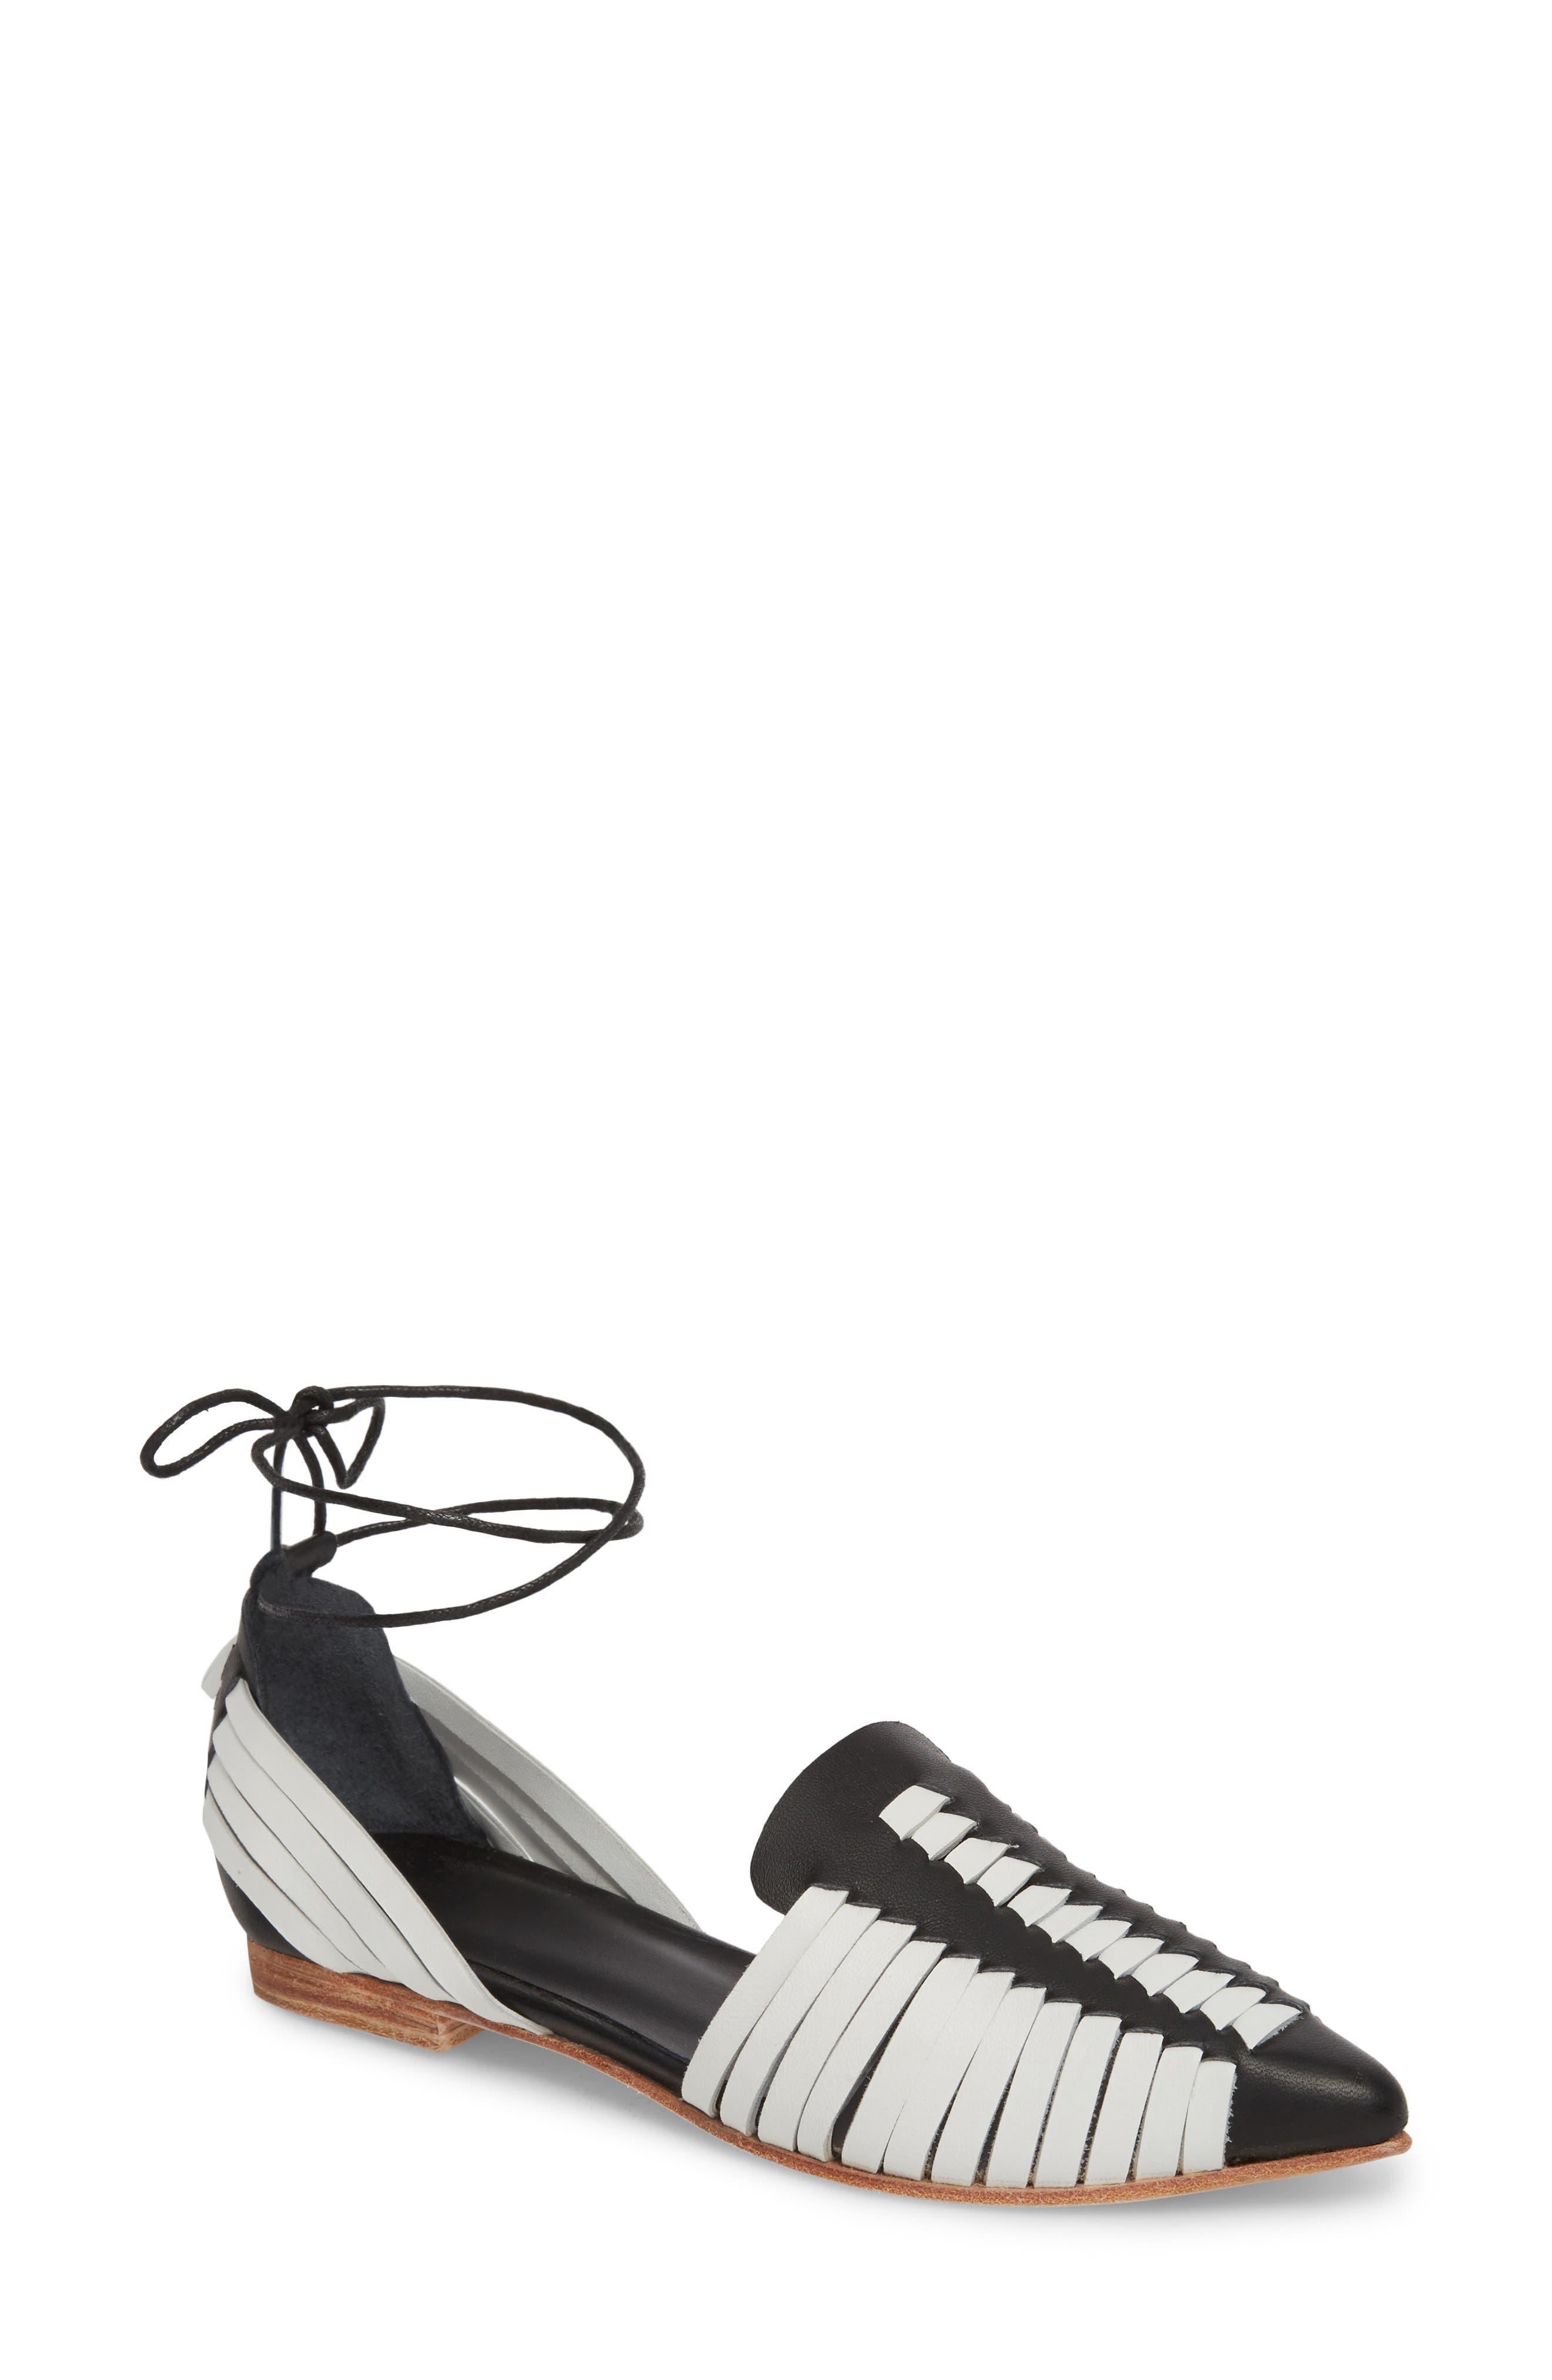 Hollis Huarache Ankle Tie Flat,                         Main,                         color, BLACK/ WHITE LEATHER